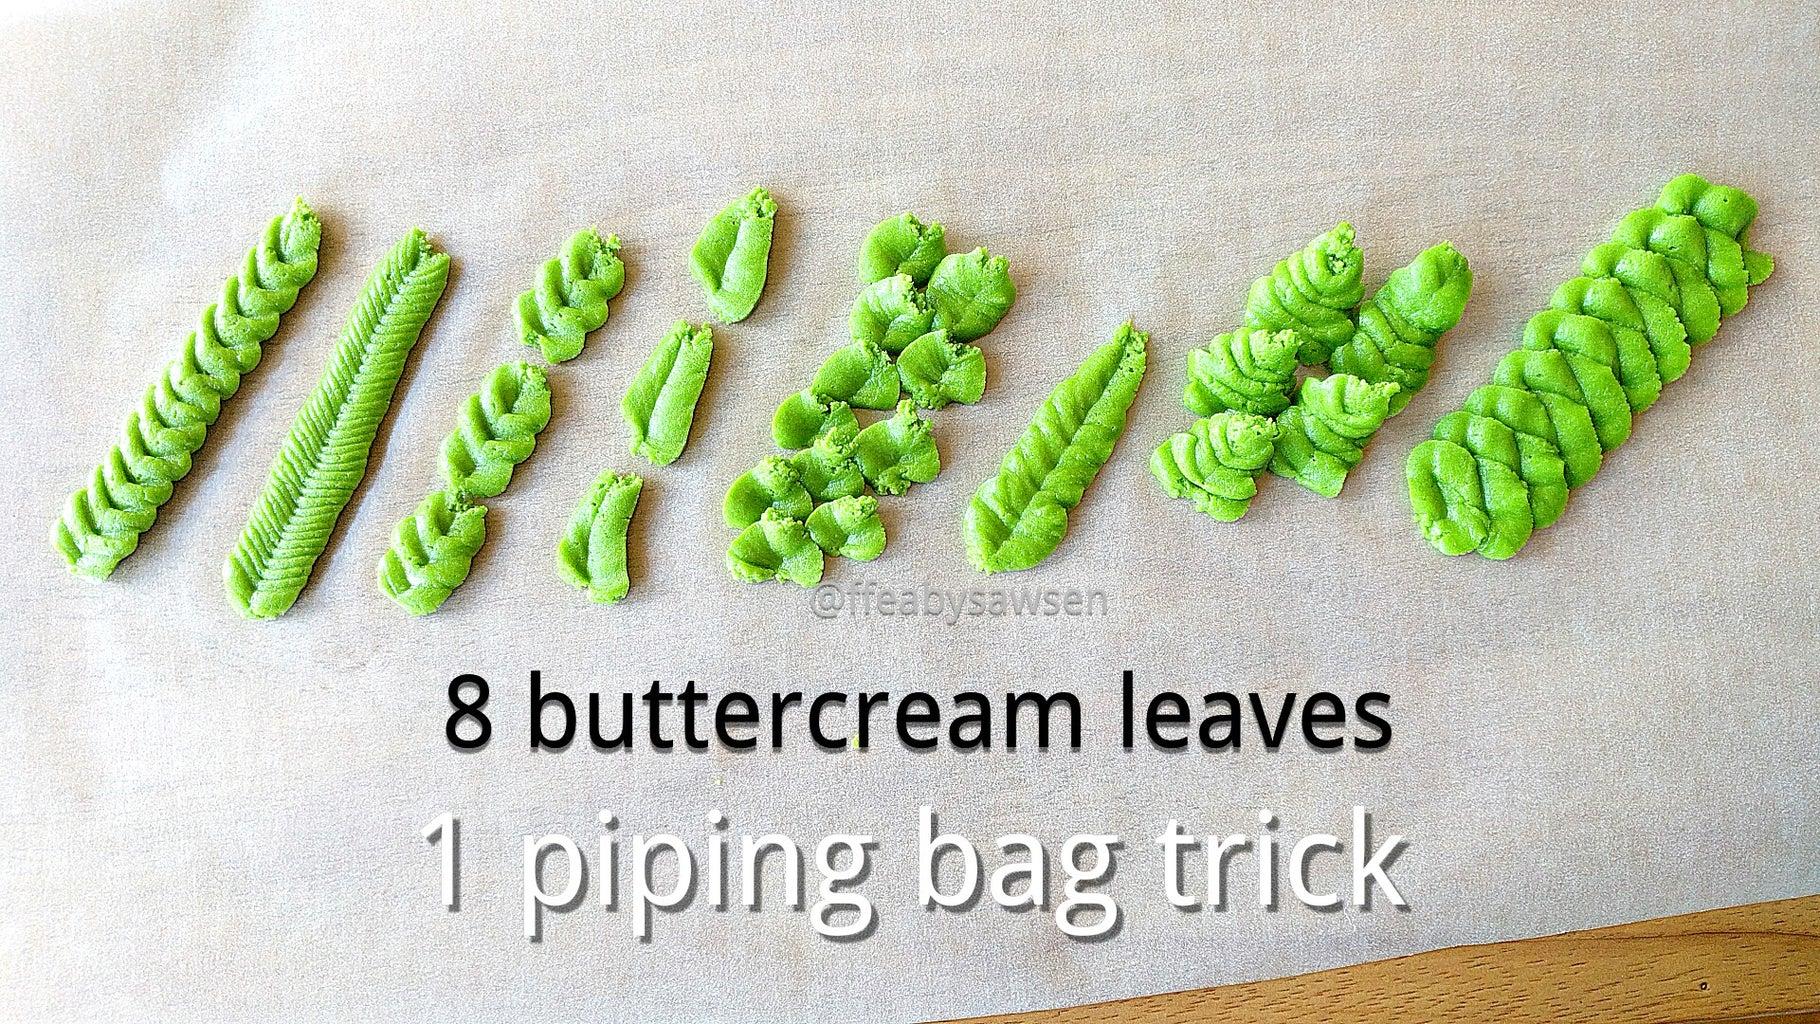 DIY Leaf Piping Tip & 8 Buttercream Leaves